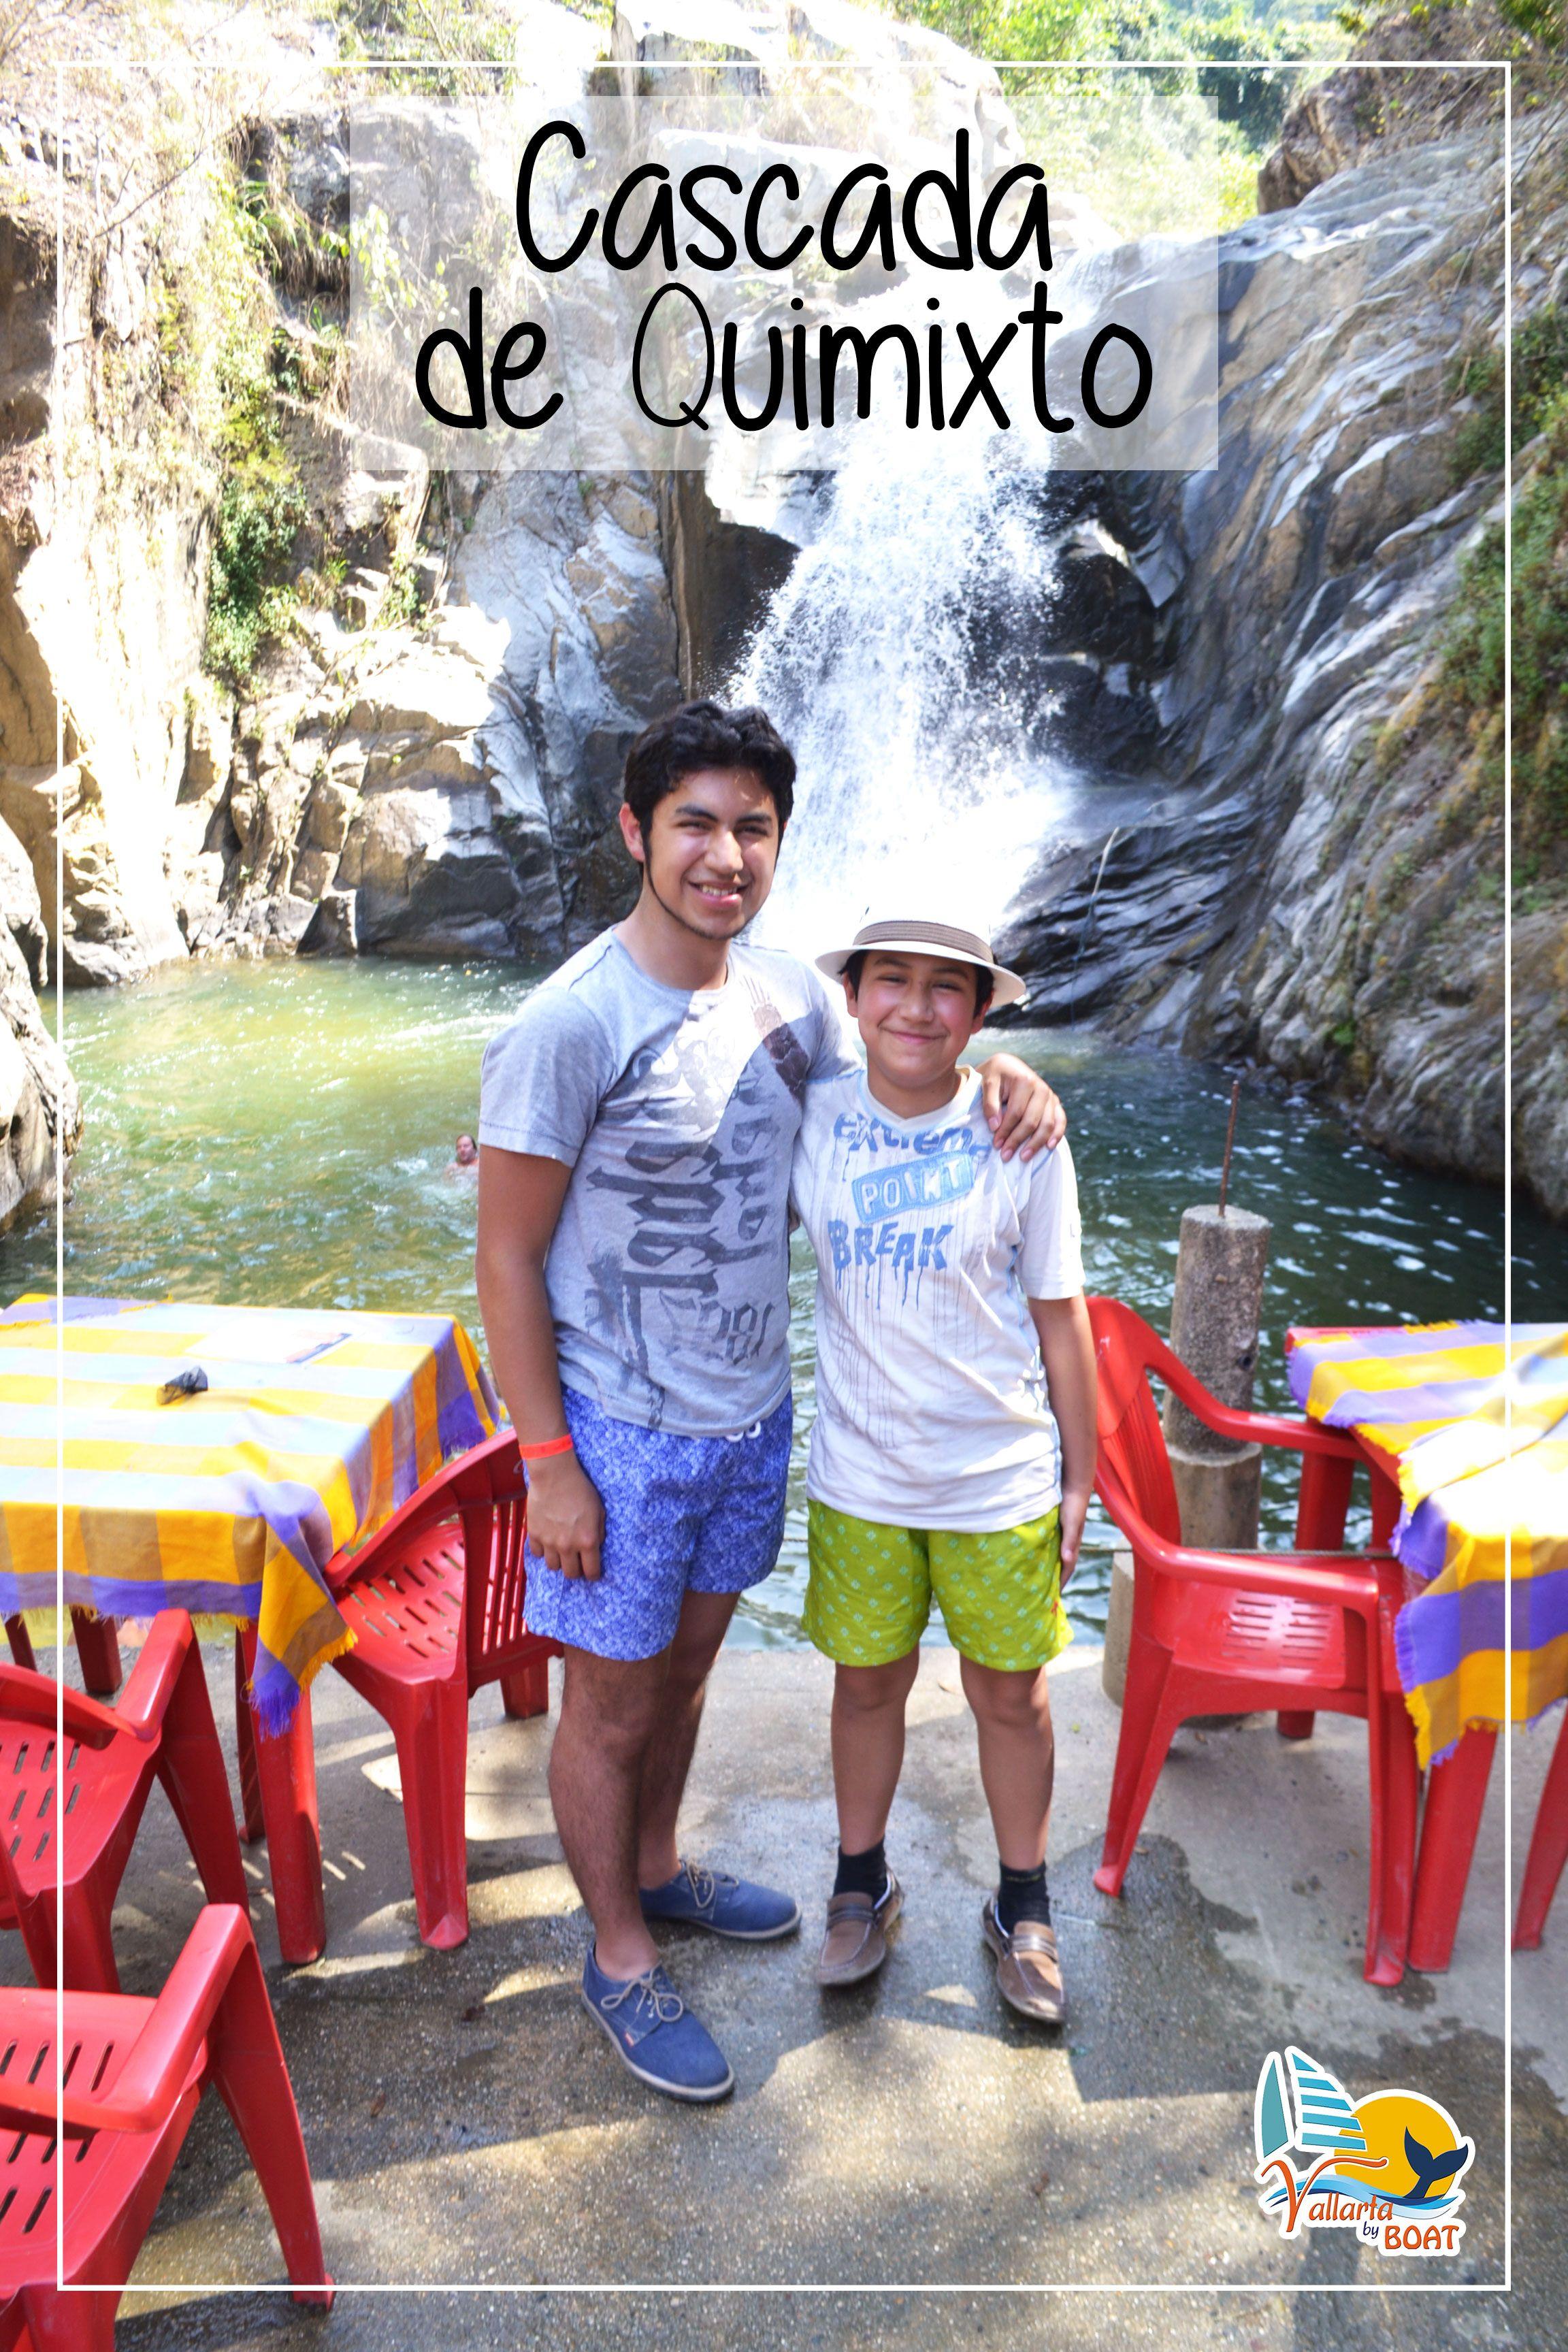 Cascada de Quimixto - #waterfall #VallartaByBoat #PuertoVallarta